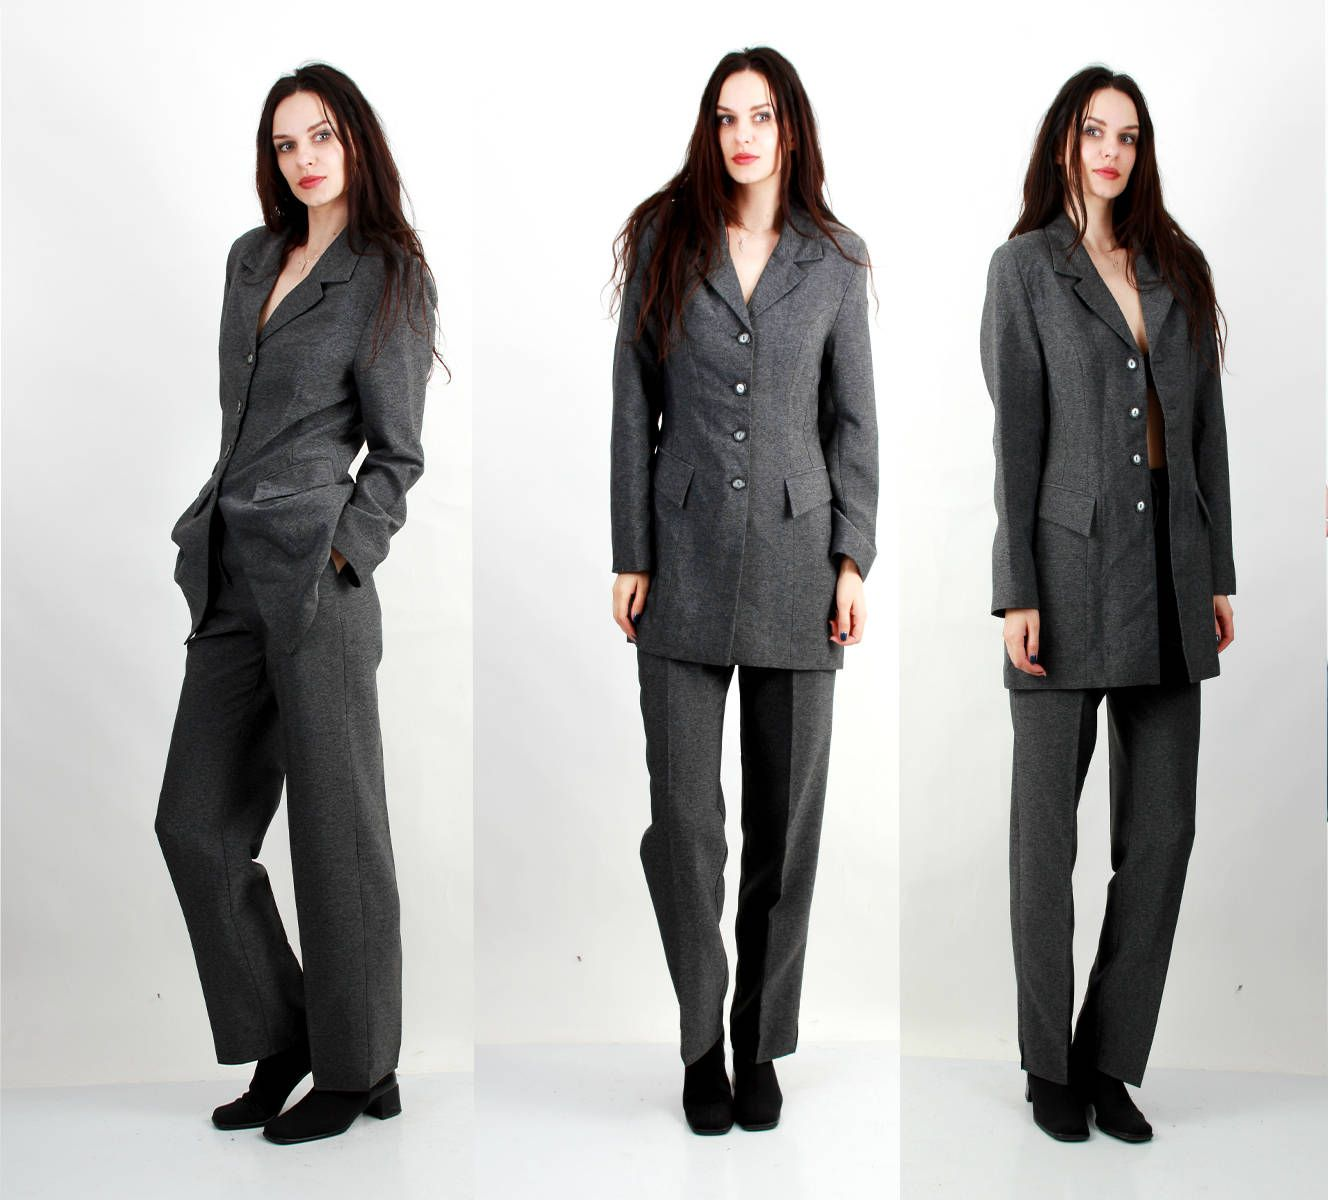 Vintage 80s Formal Suit Business Suit Two Pieces Outfit